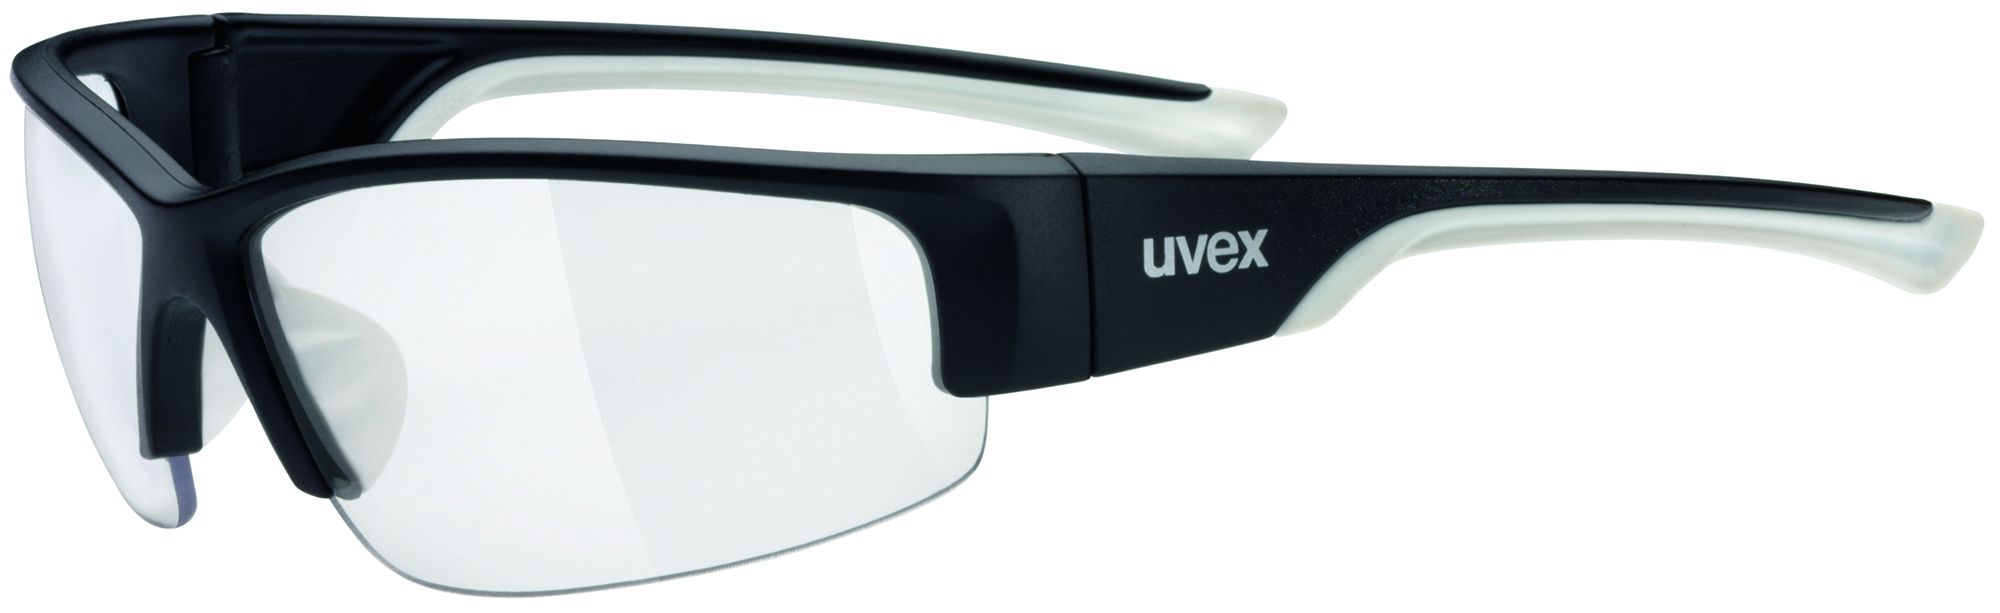 все цены на Uvex Солнцезащитные очки Uvex Sportstyle 215